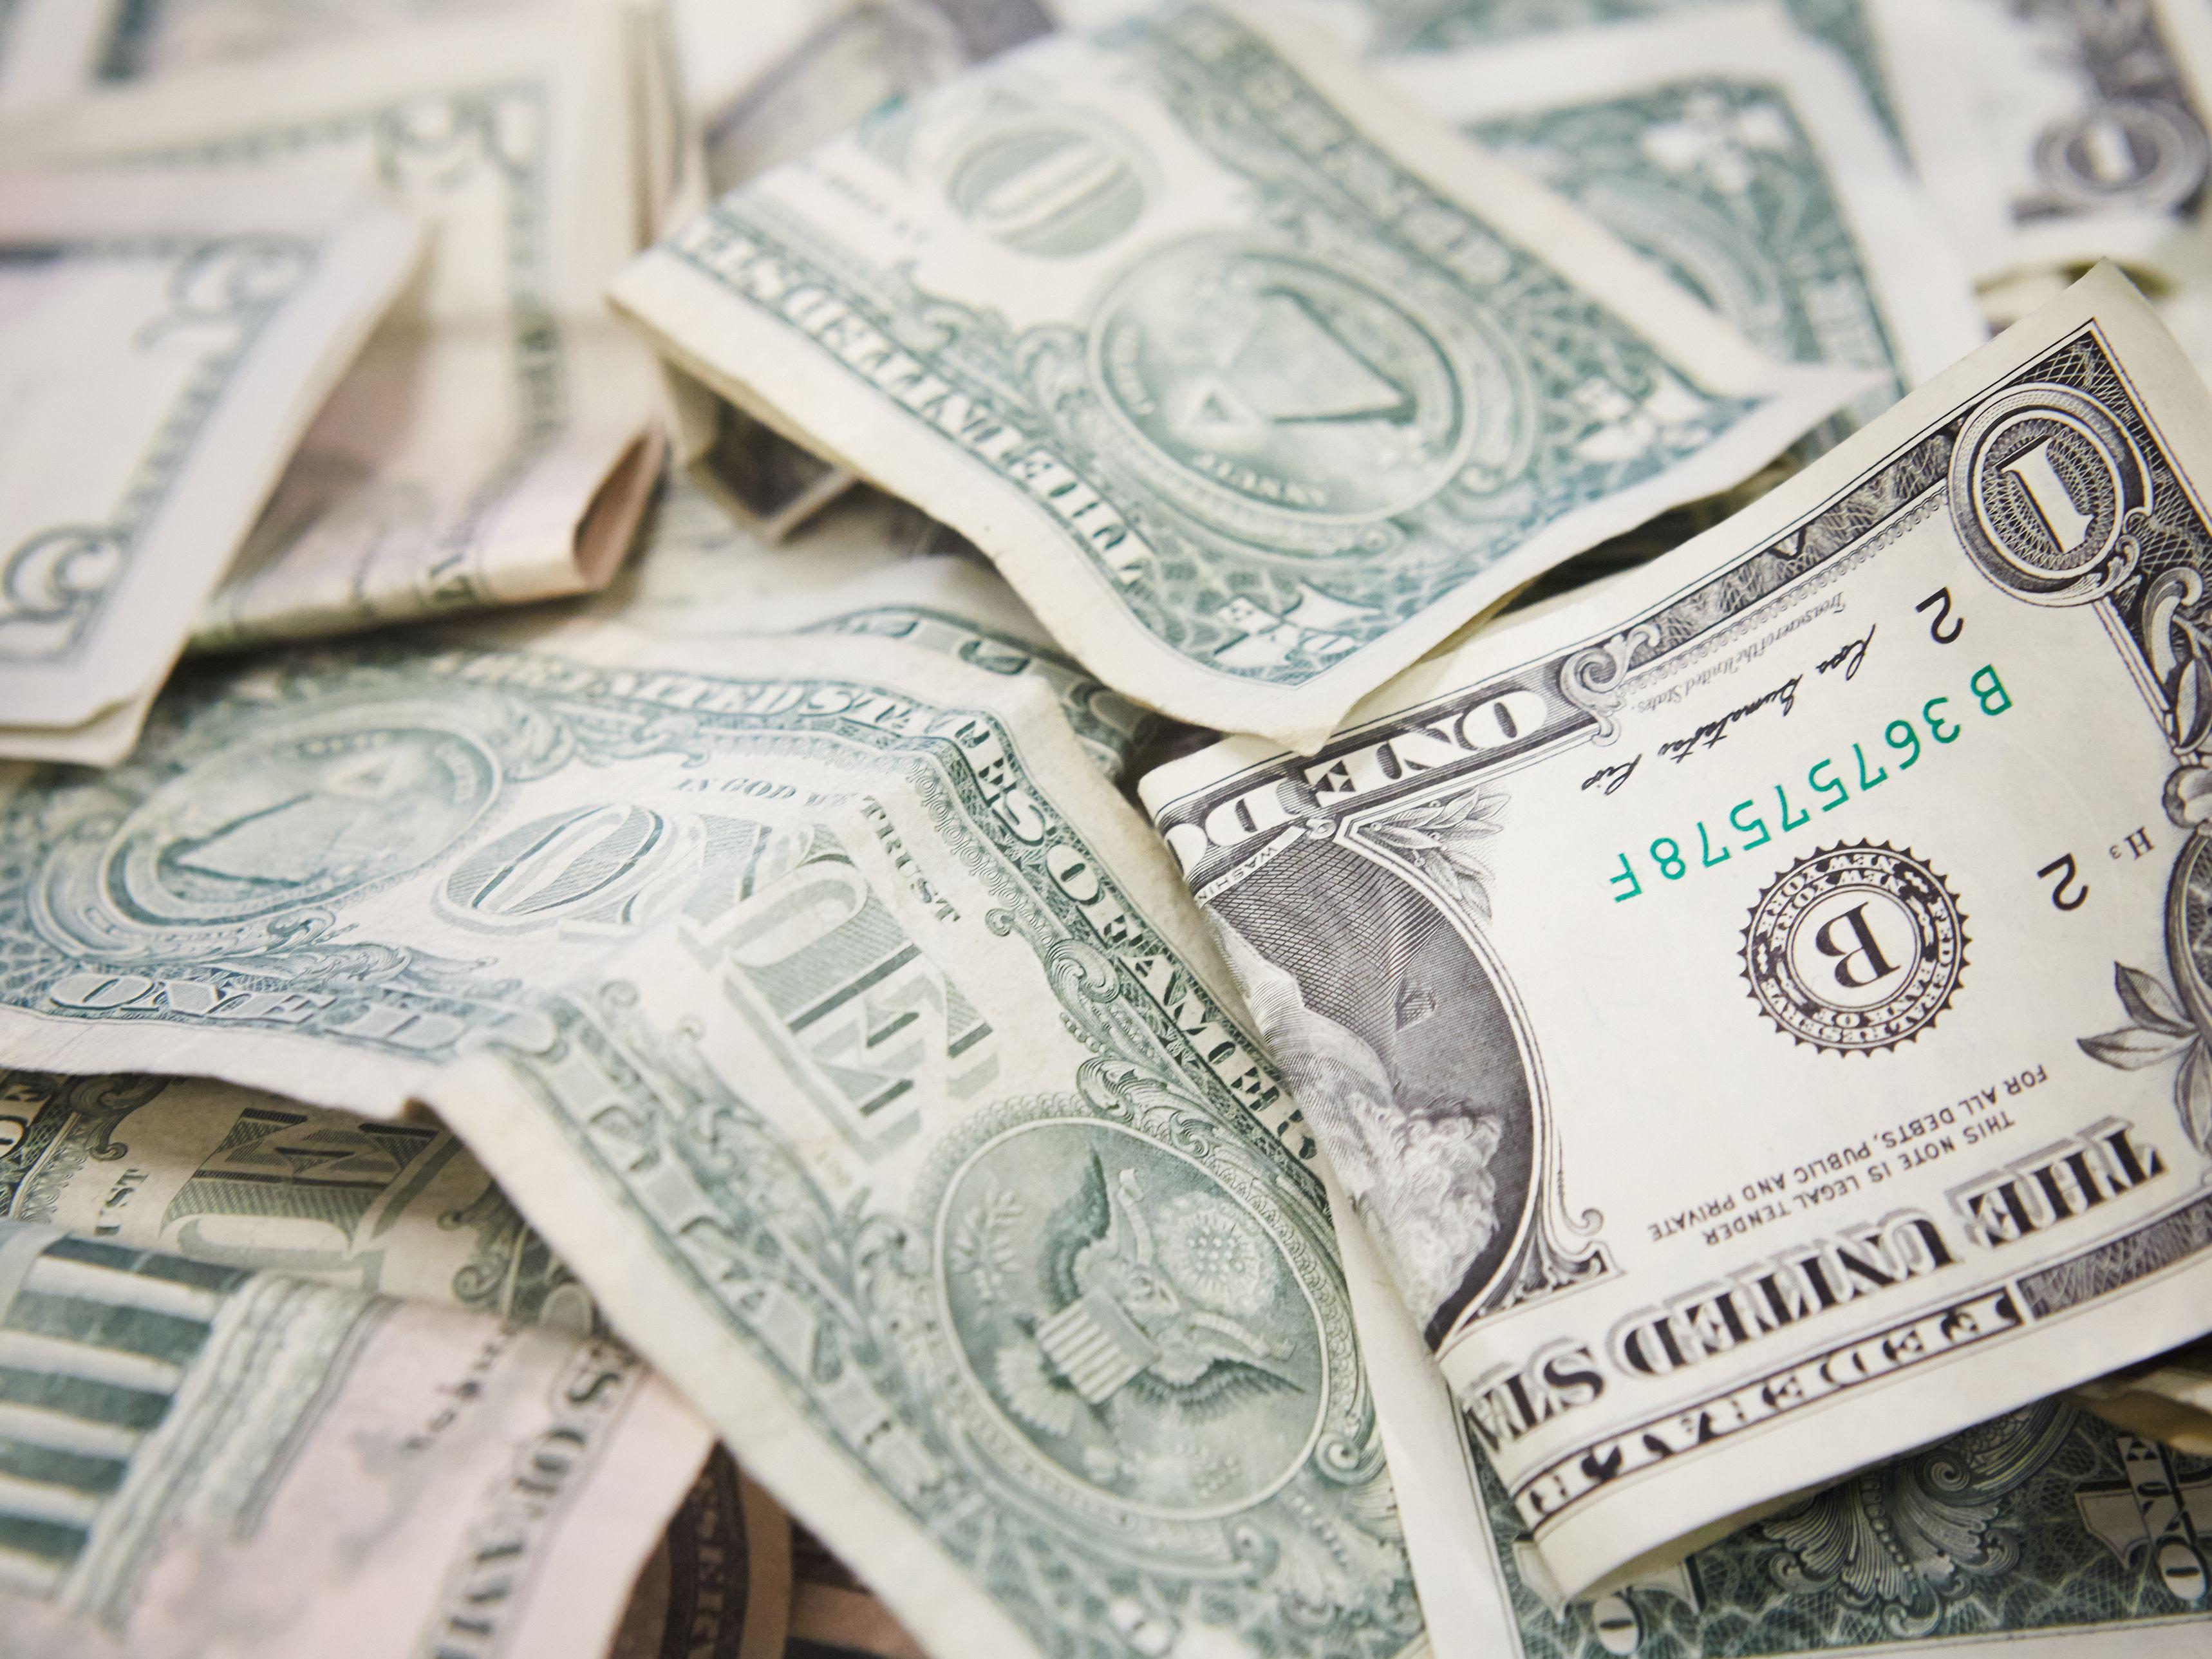 Easy Money Origami Heart Folding Instructions - How to Make Dollar ...   2577x3436